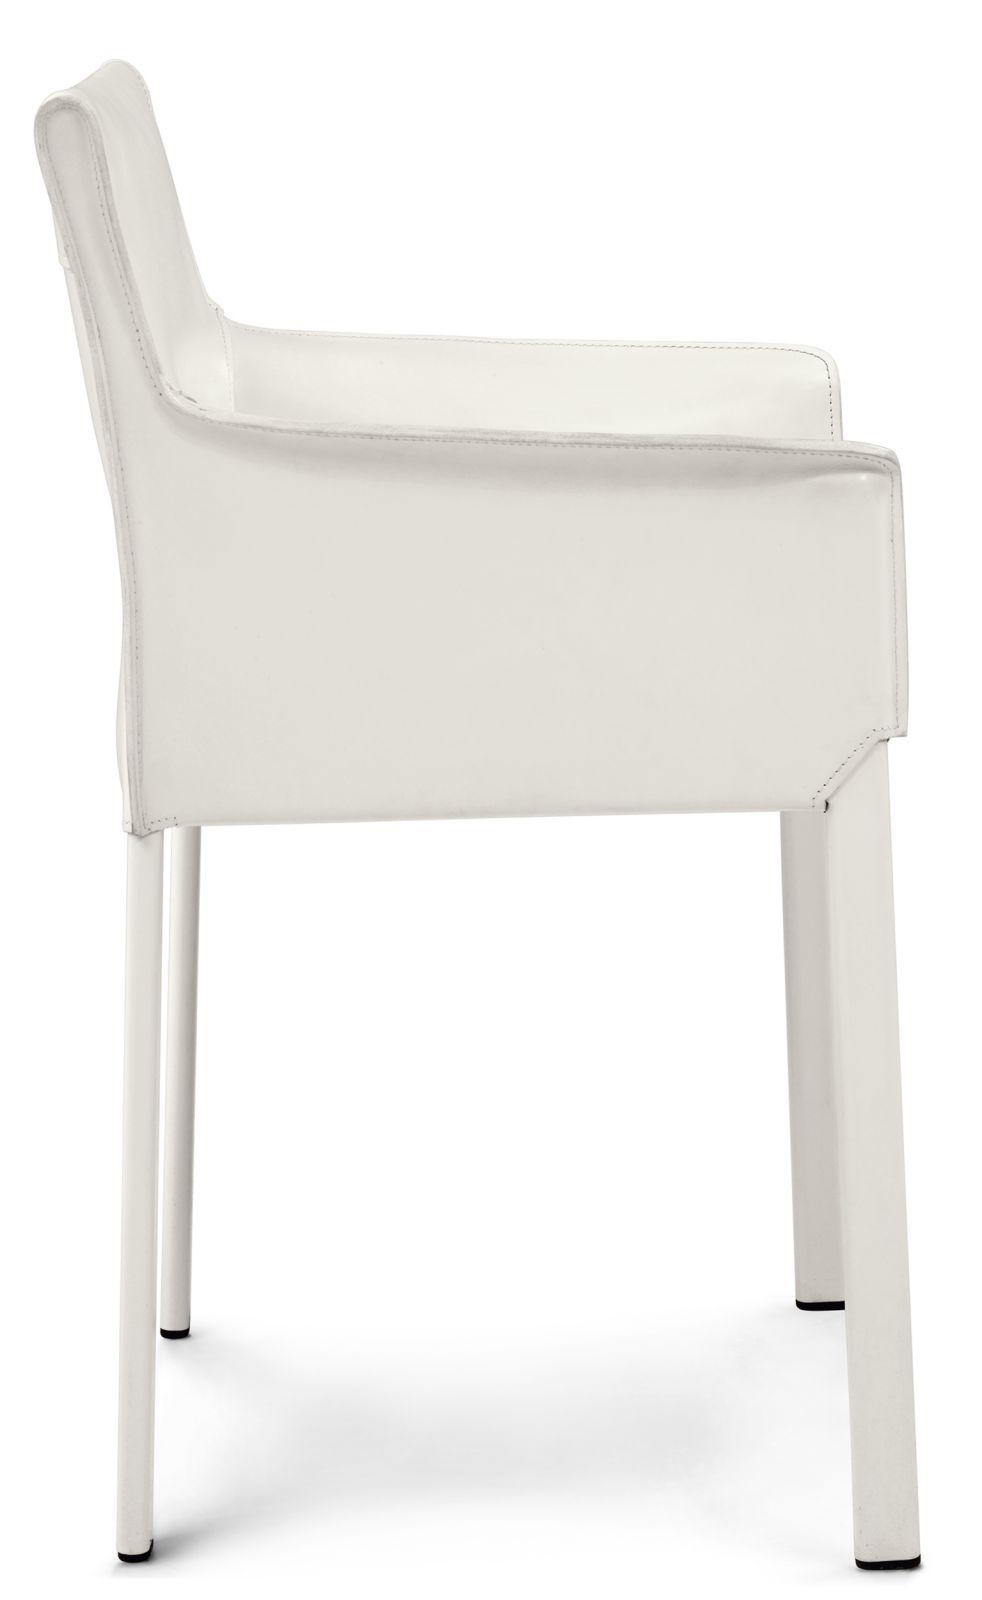 modern-office-armchairs-Italian-furniture-designer-armchairs (39).jpg